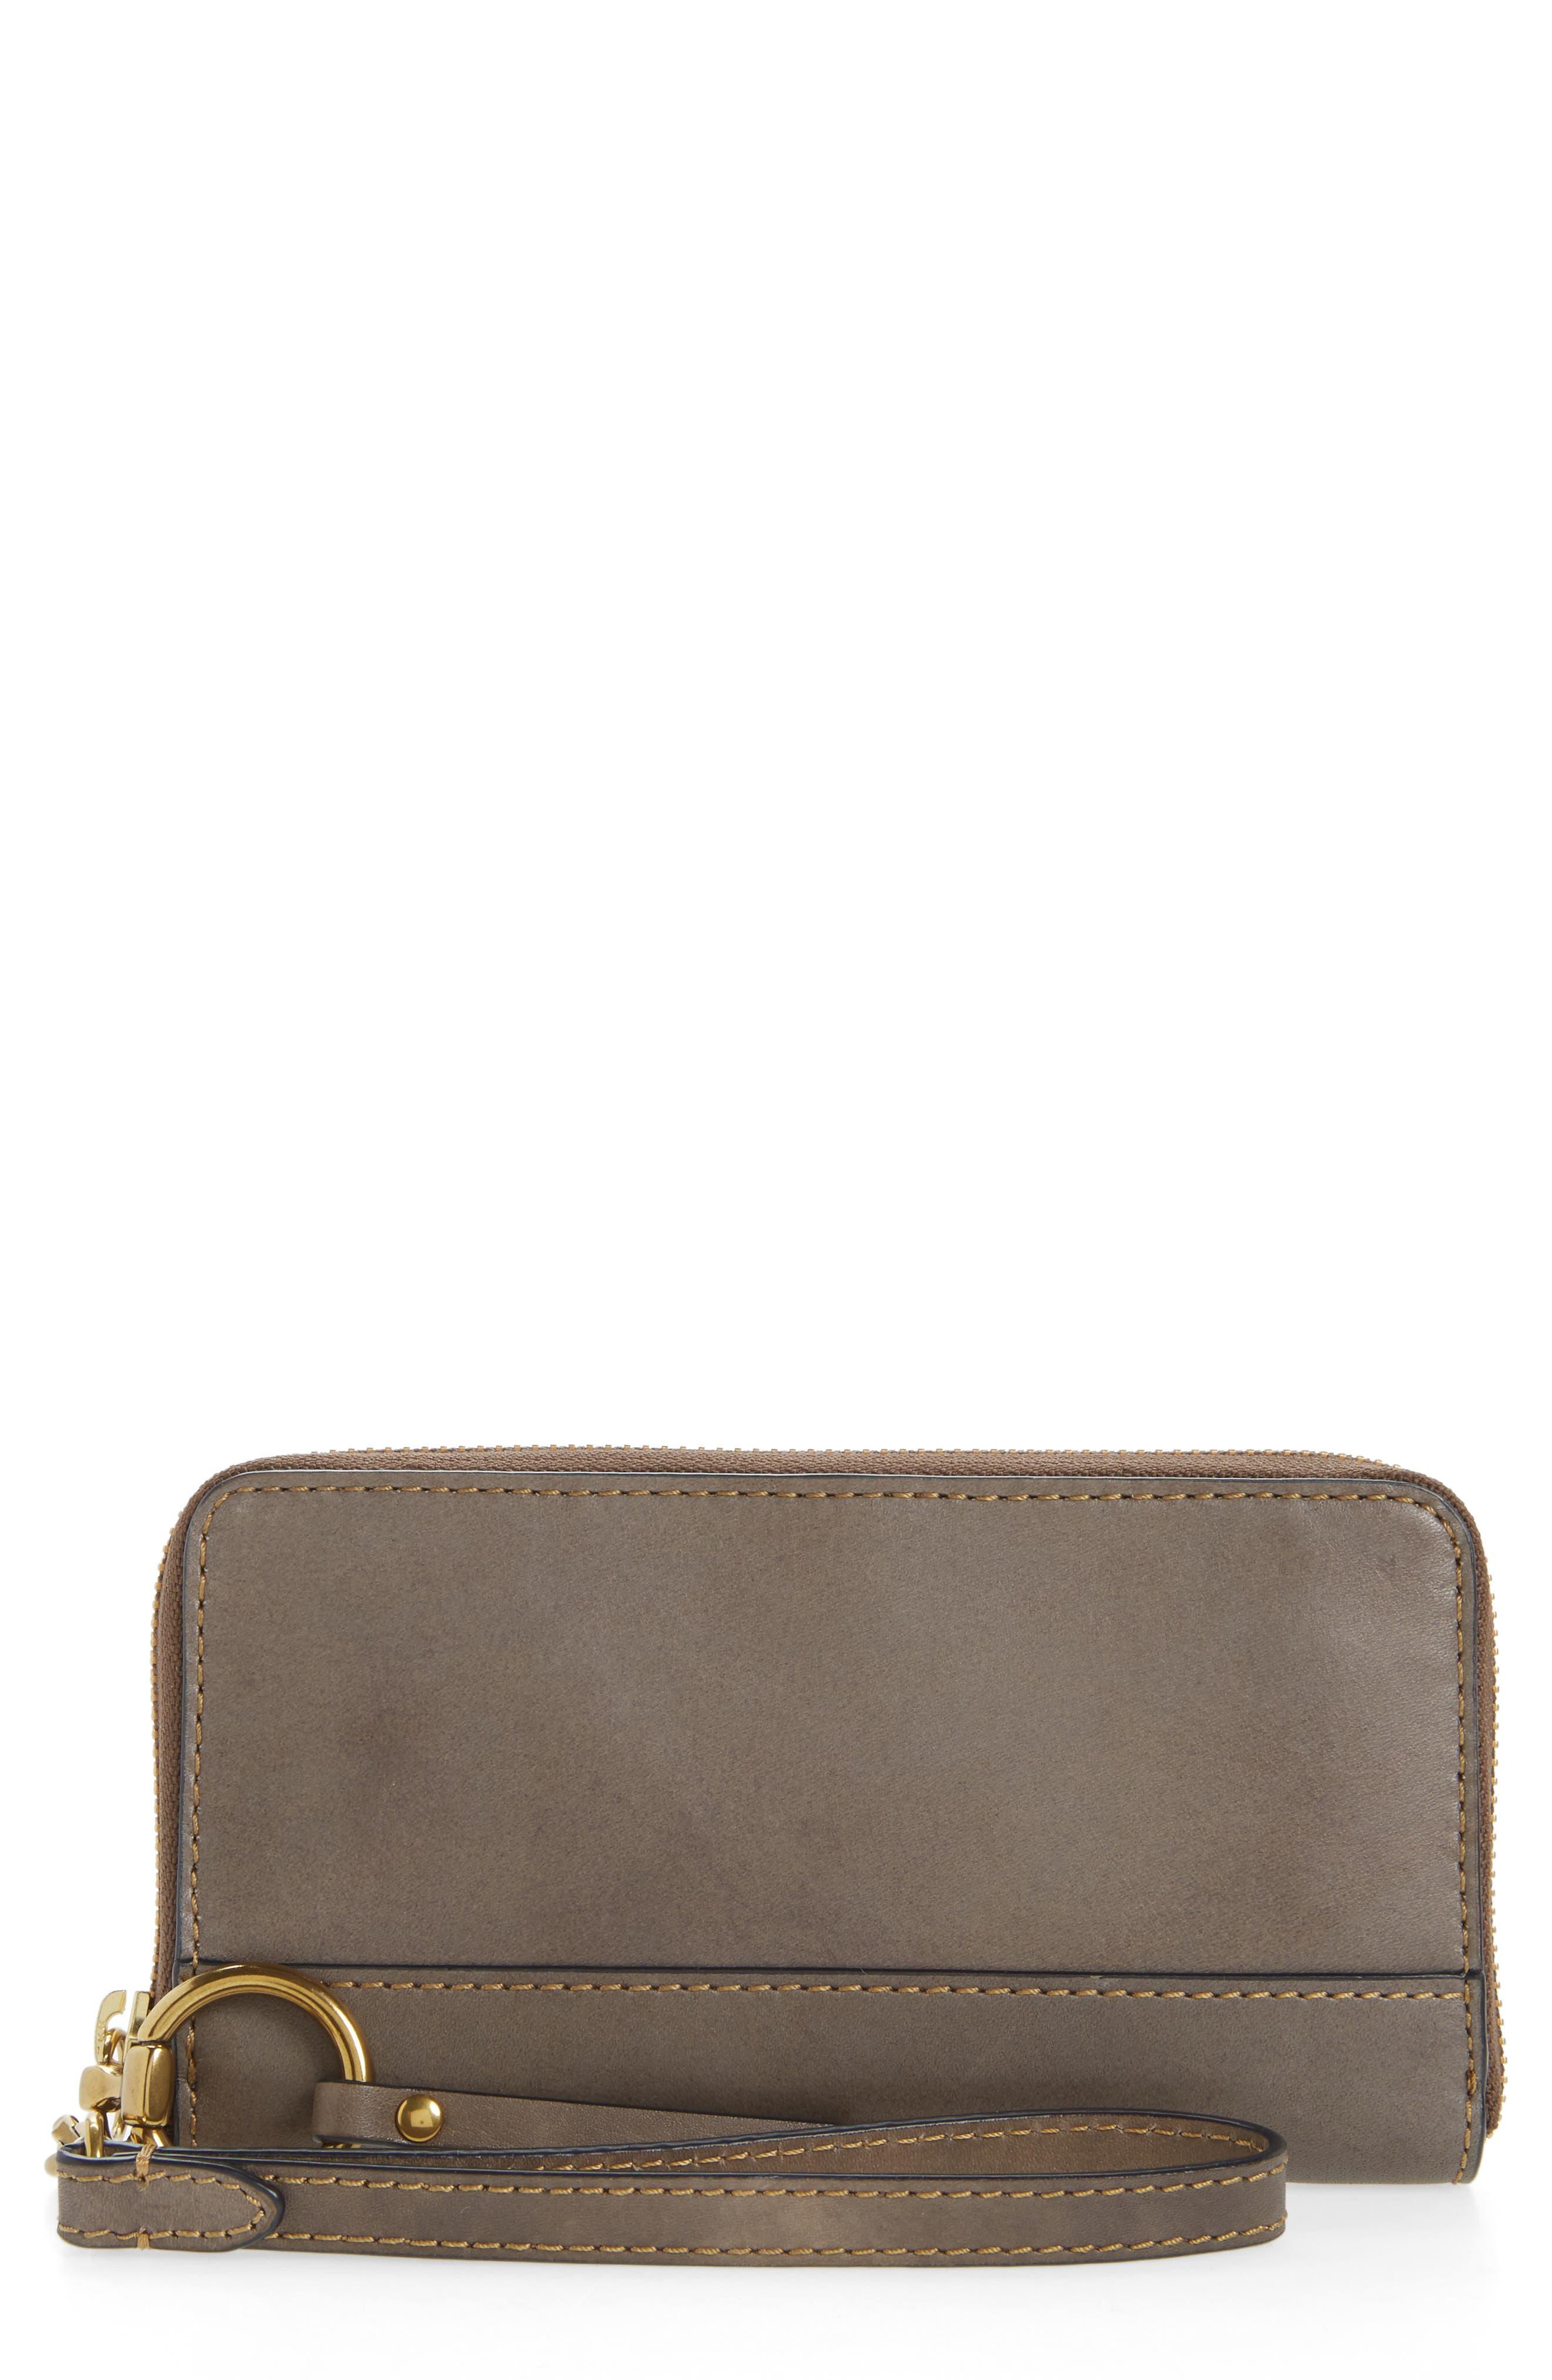 Main Image - Frye Ilana Harness Phone Leather Zip Wallet